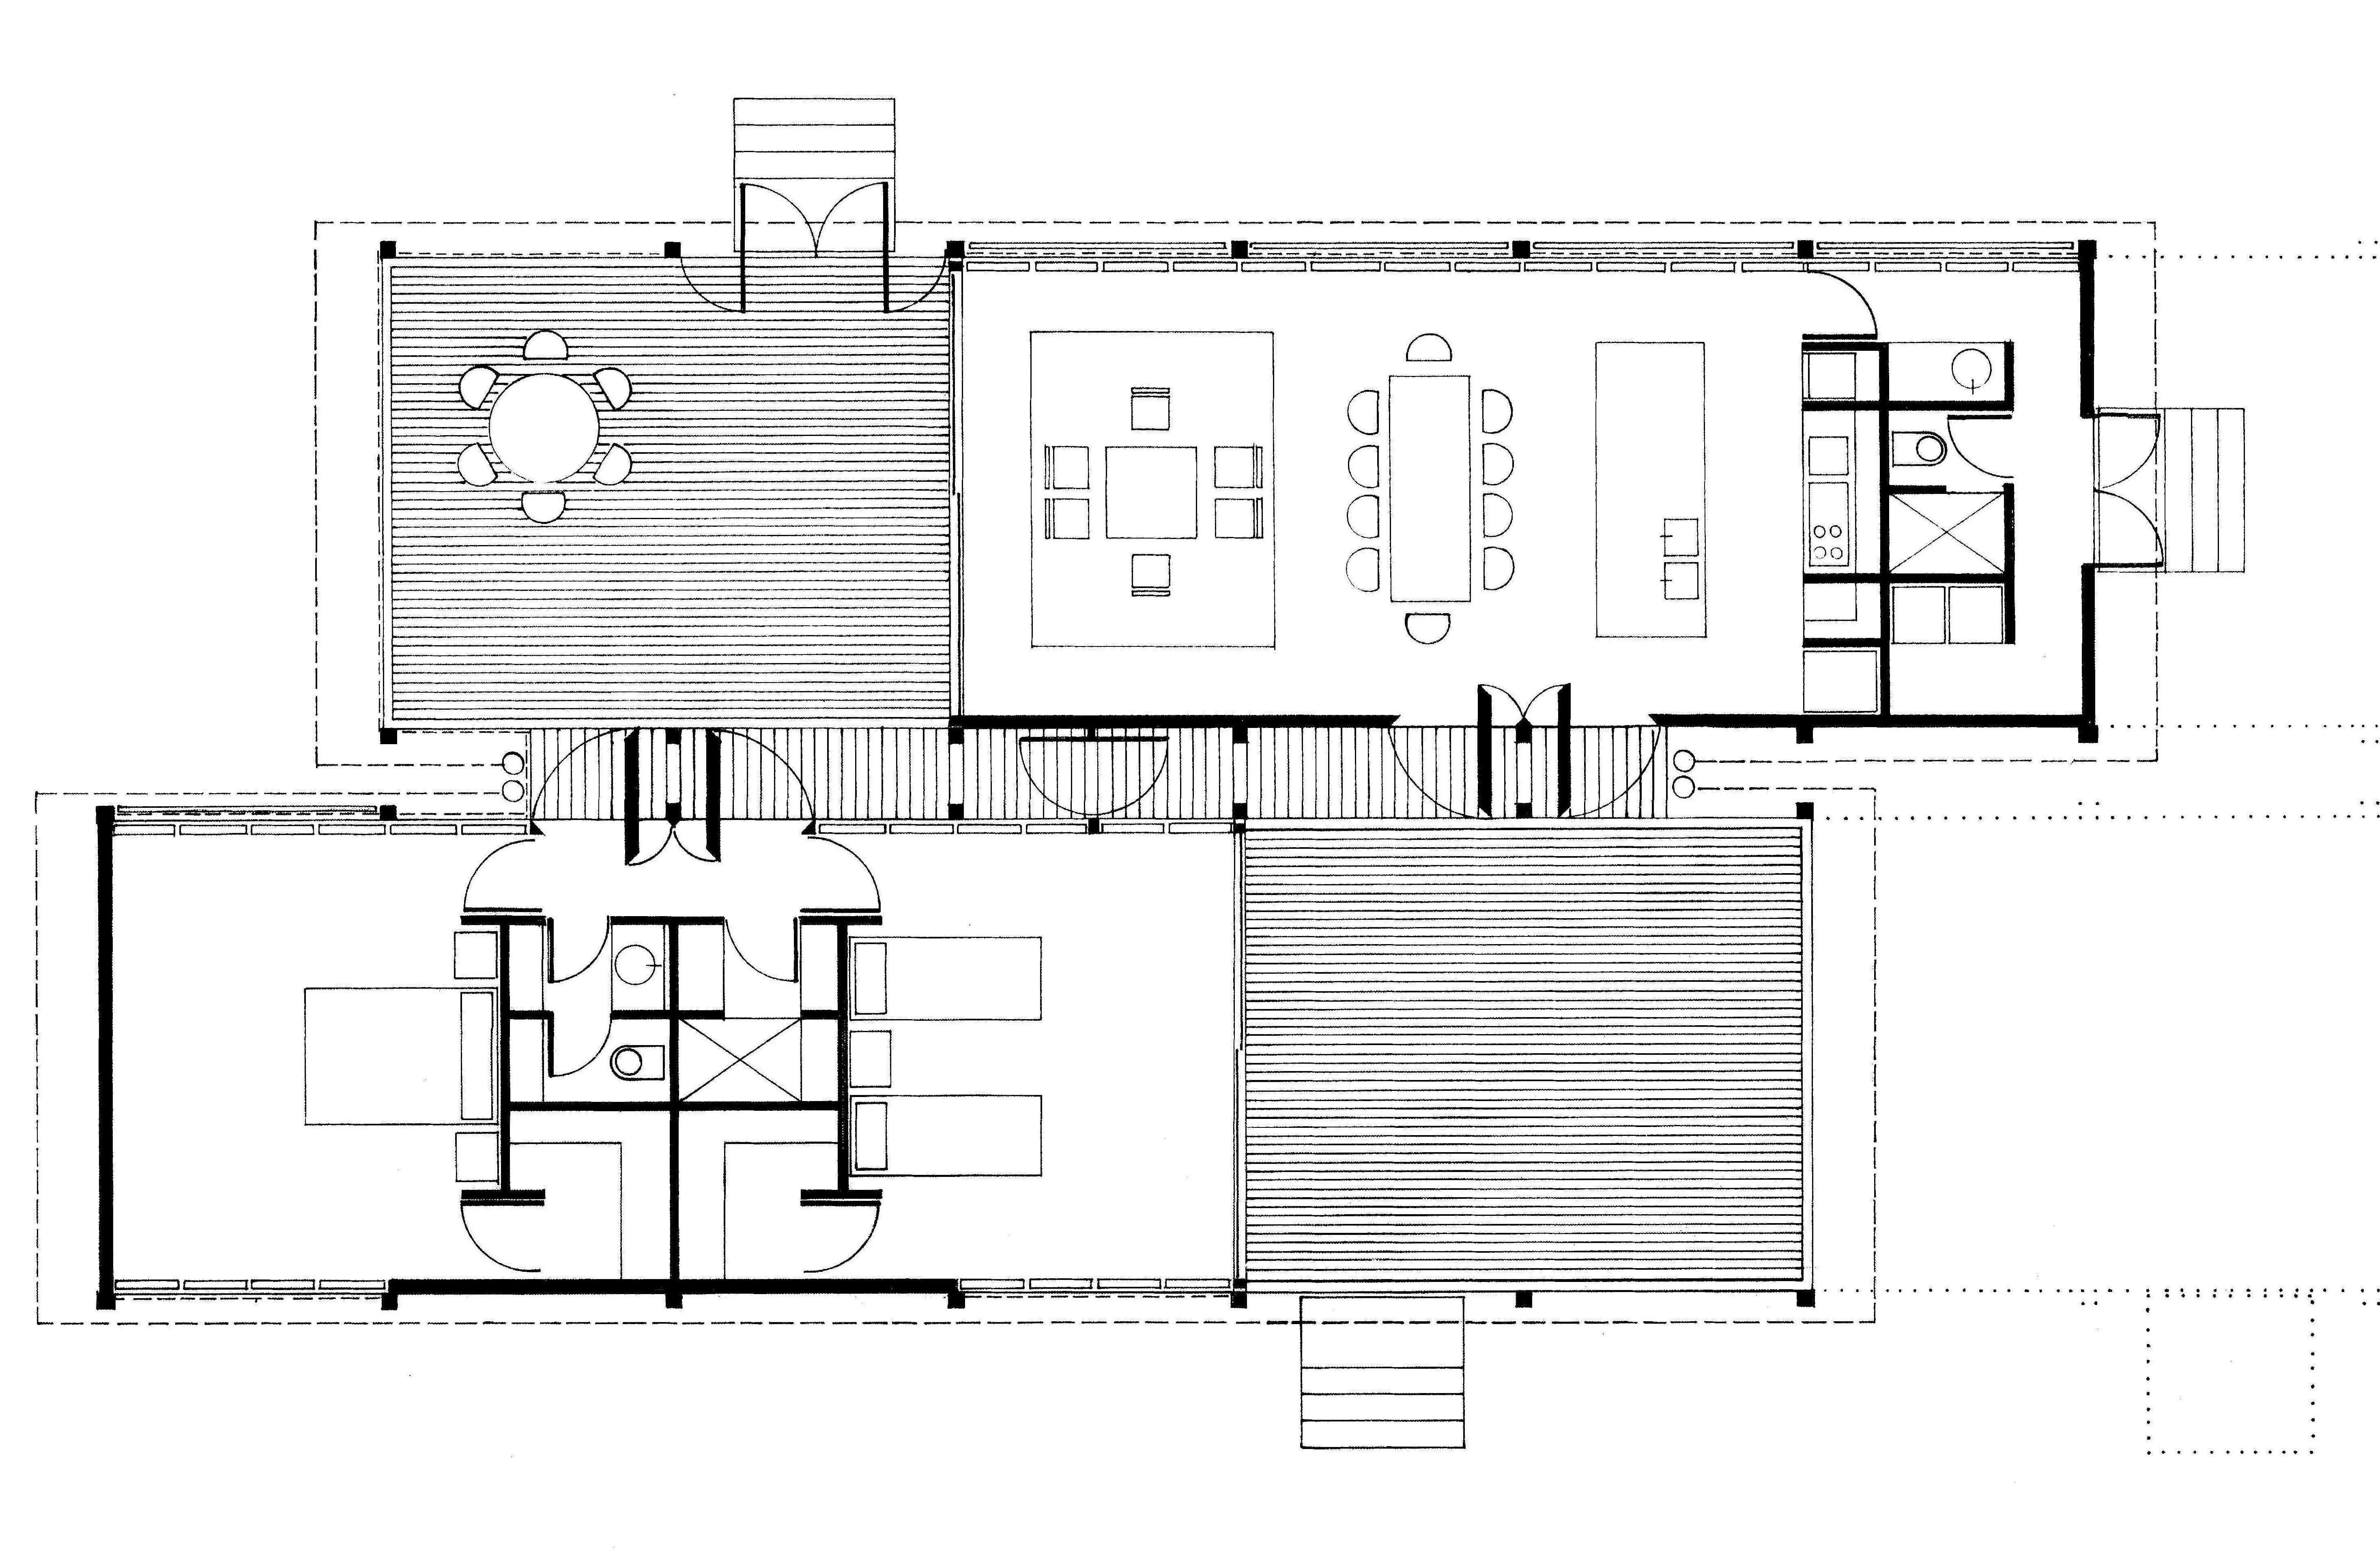 Floor plan of original 1975 Marie Short house designed by Glenn Murcutt